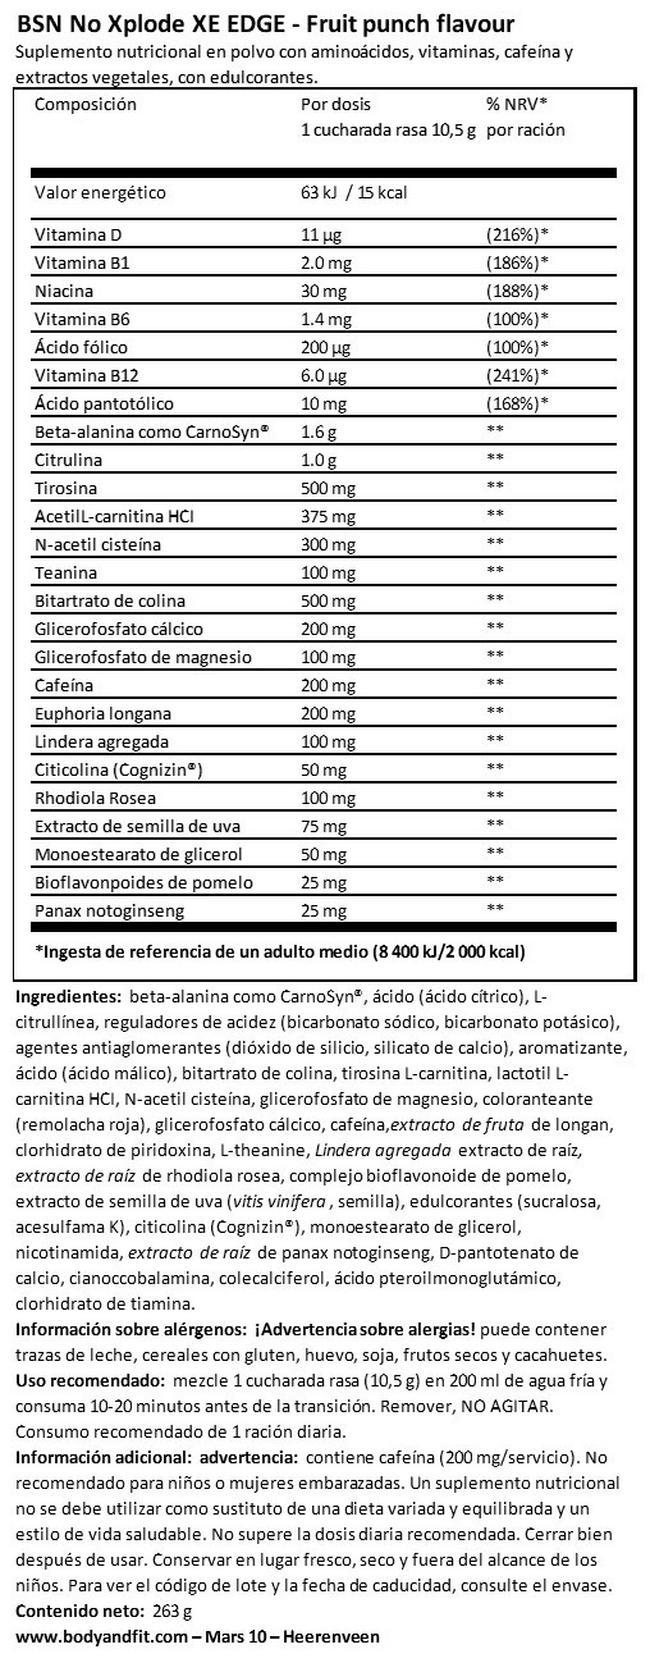 No Xplode XE EDGE Nutritional Information 1